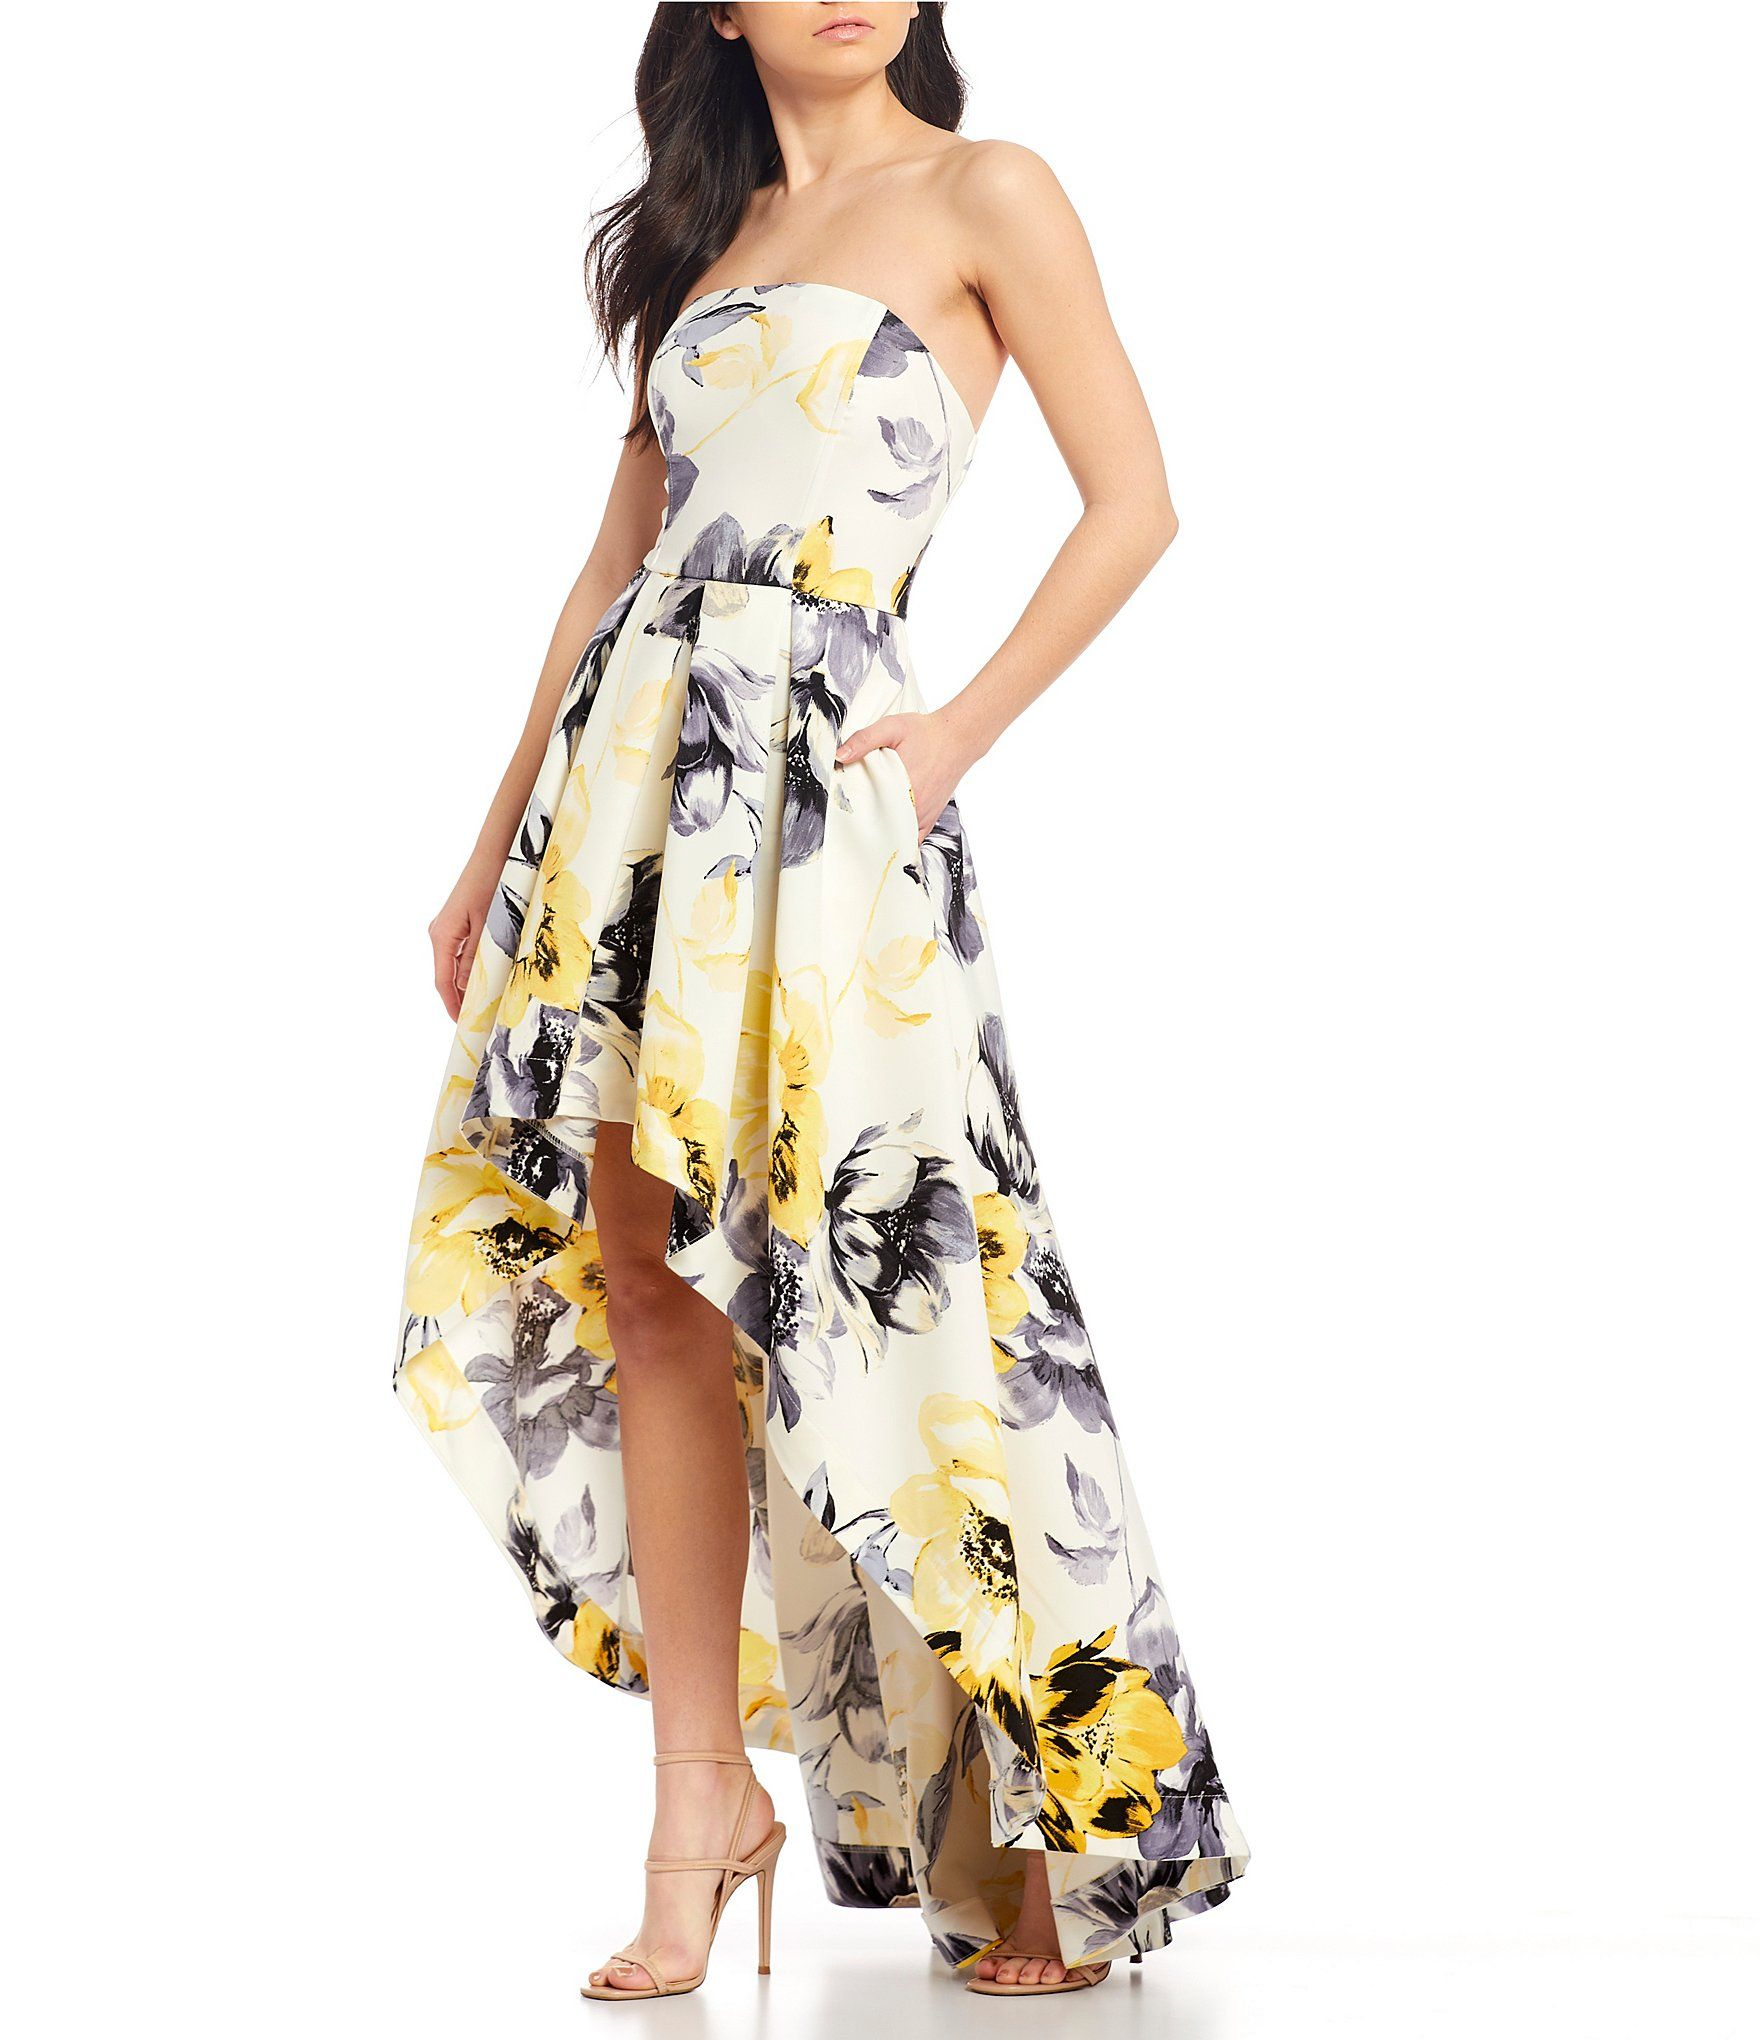 Xtraordinary Strapless Floral Print Satin Long High Low Dress Dillard S In 2021 Black Long Sleeve Cocktail Dress High Low Dress Floral Dresses Long [ 2040 x 1760 Pixel ]